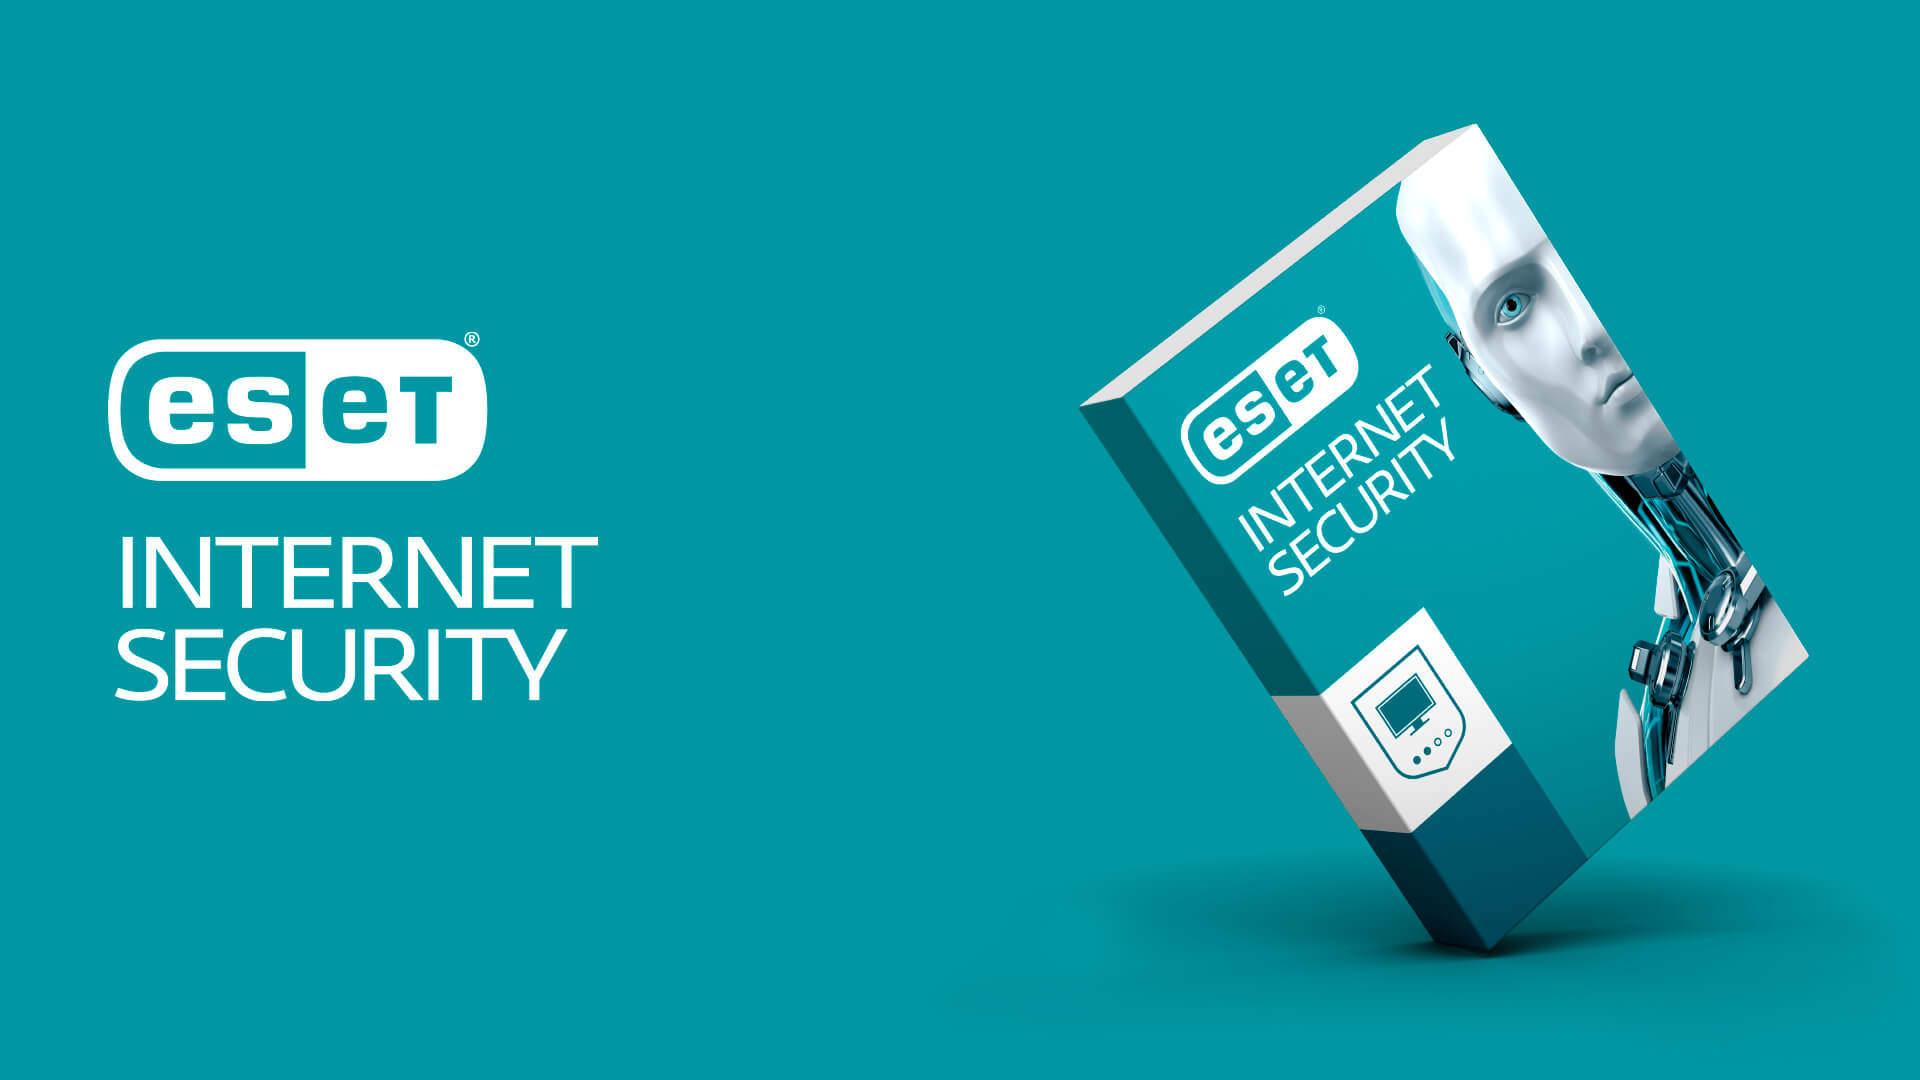 eset internet güvenliği 2018 tuşu, ESET INTERNET SECURITY 2018